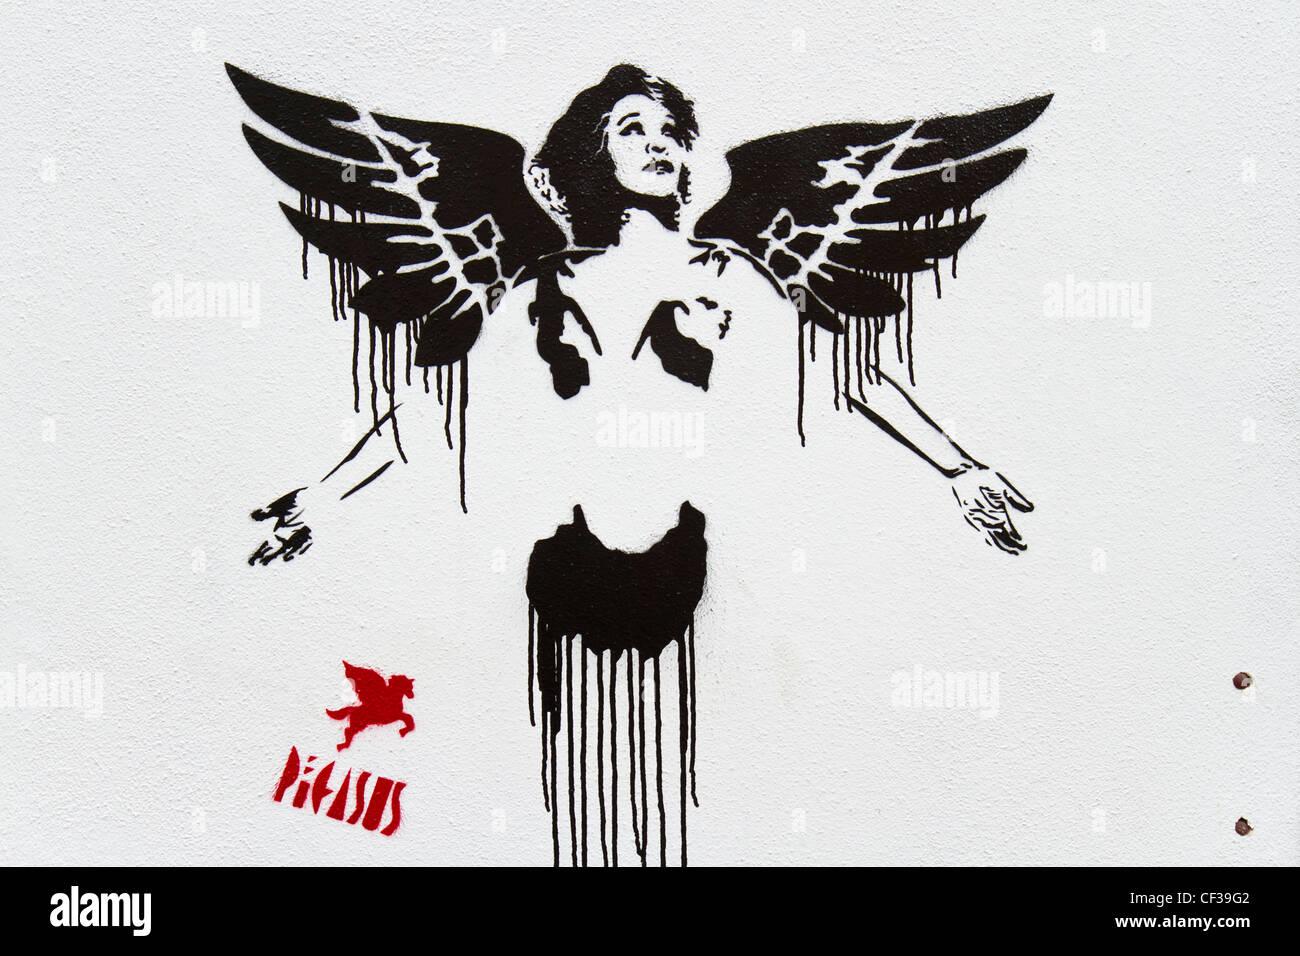 Spray Paint Stencils Uk